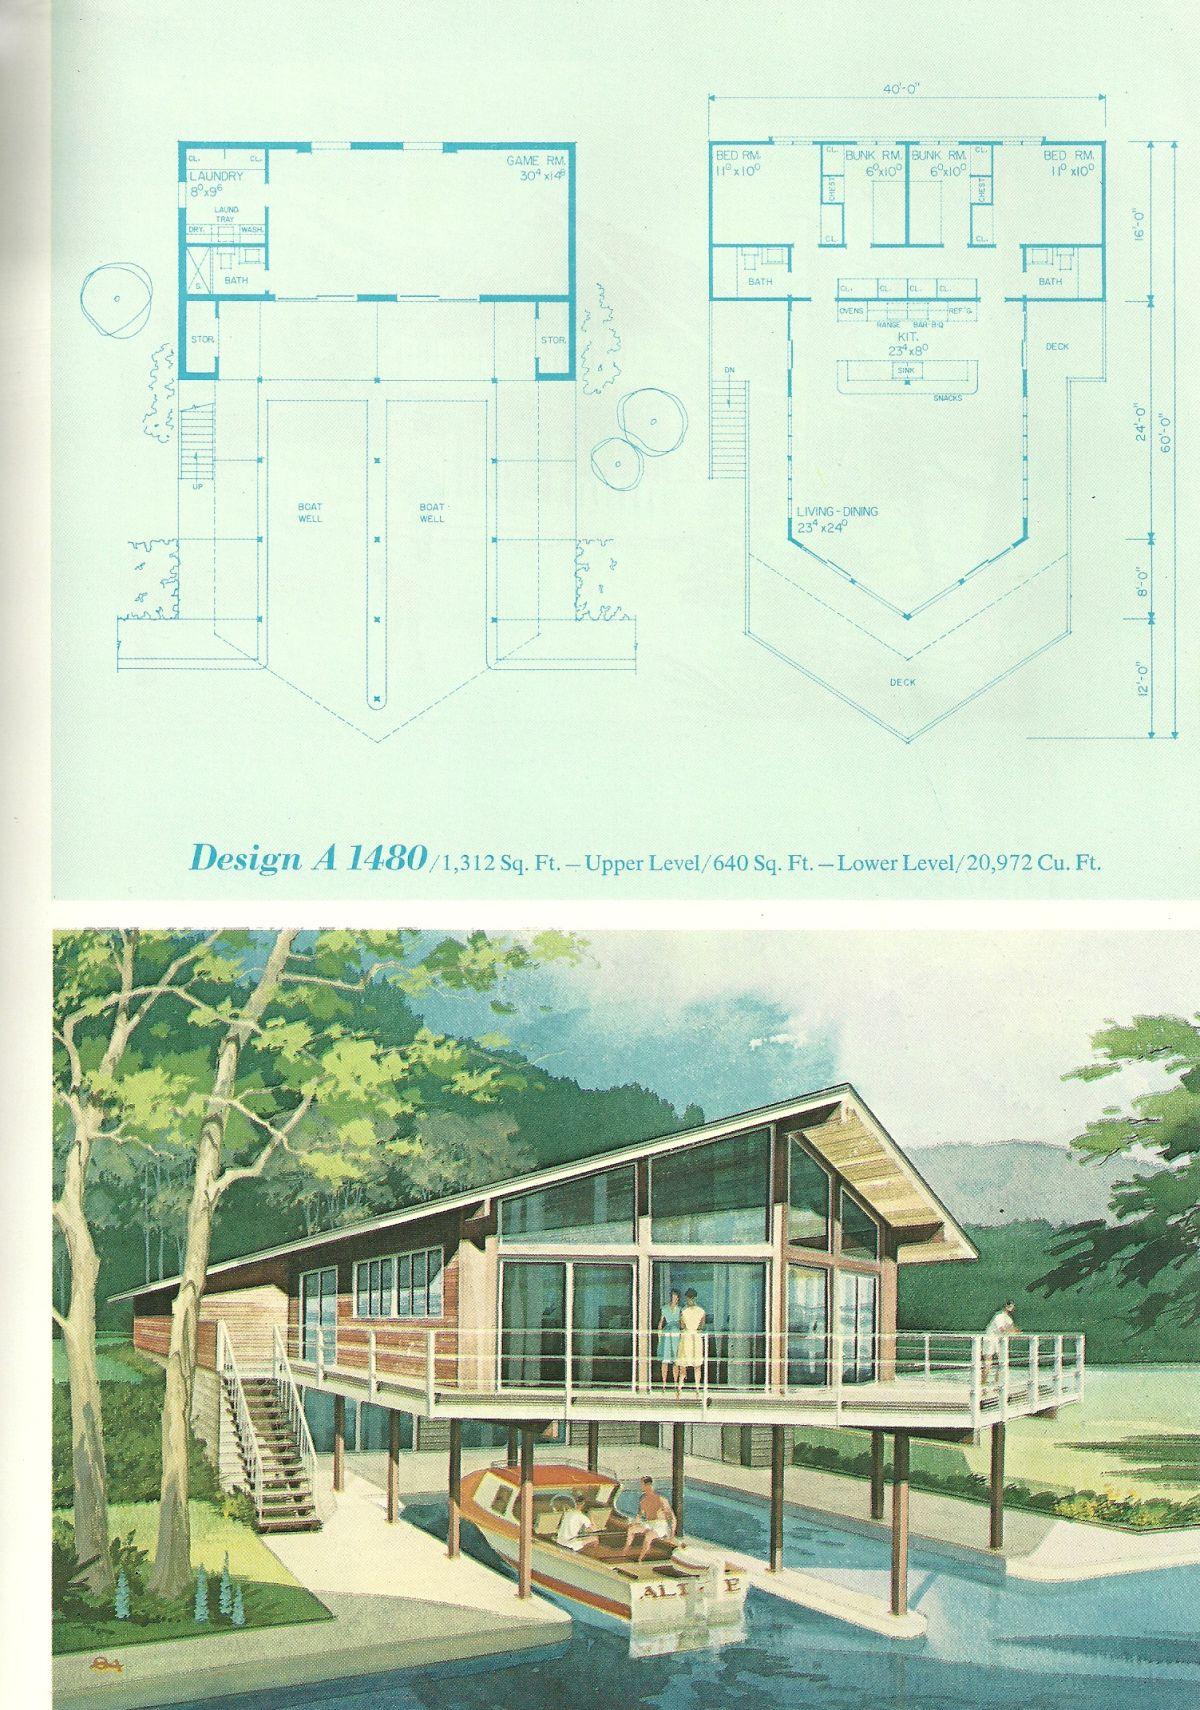 Vintage Vacation Home Plans 1480 | Vintage house plans ...